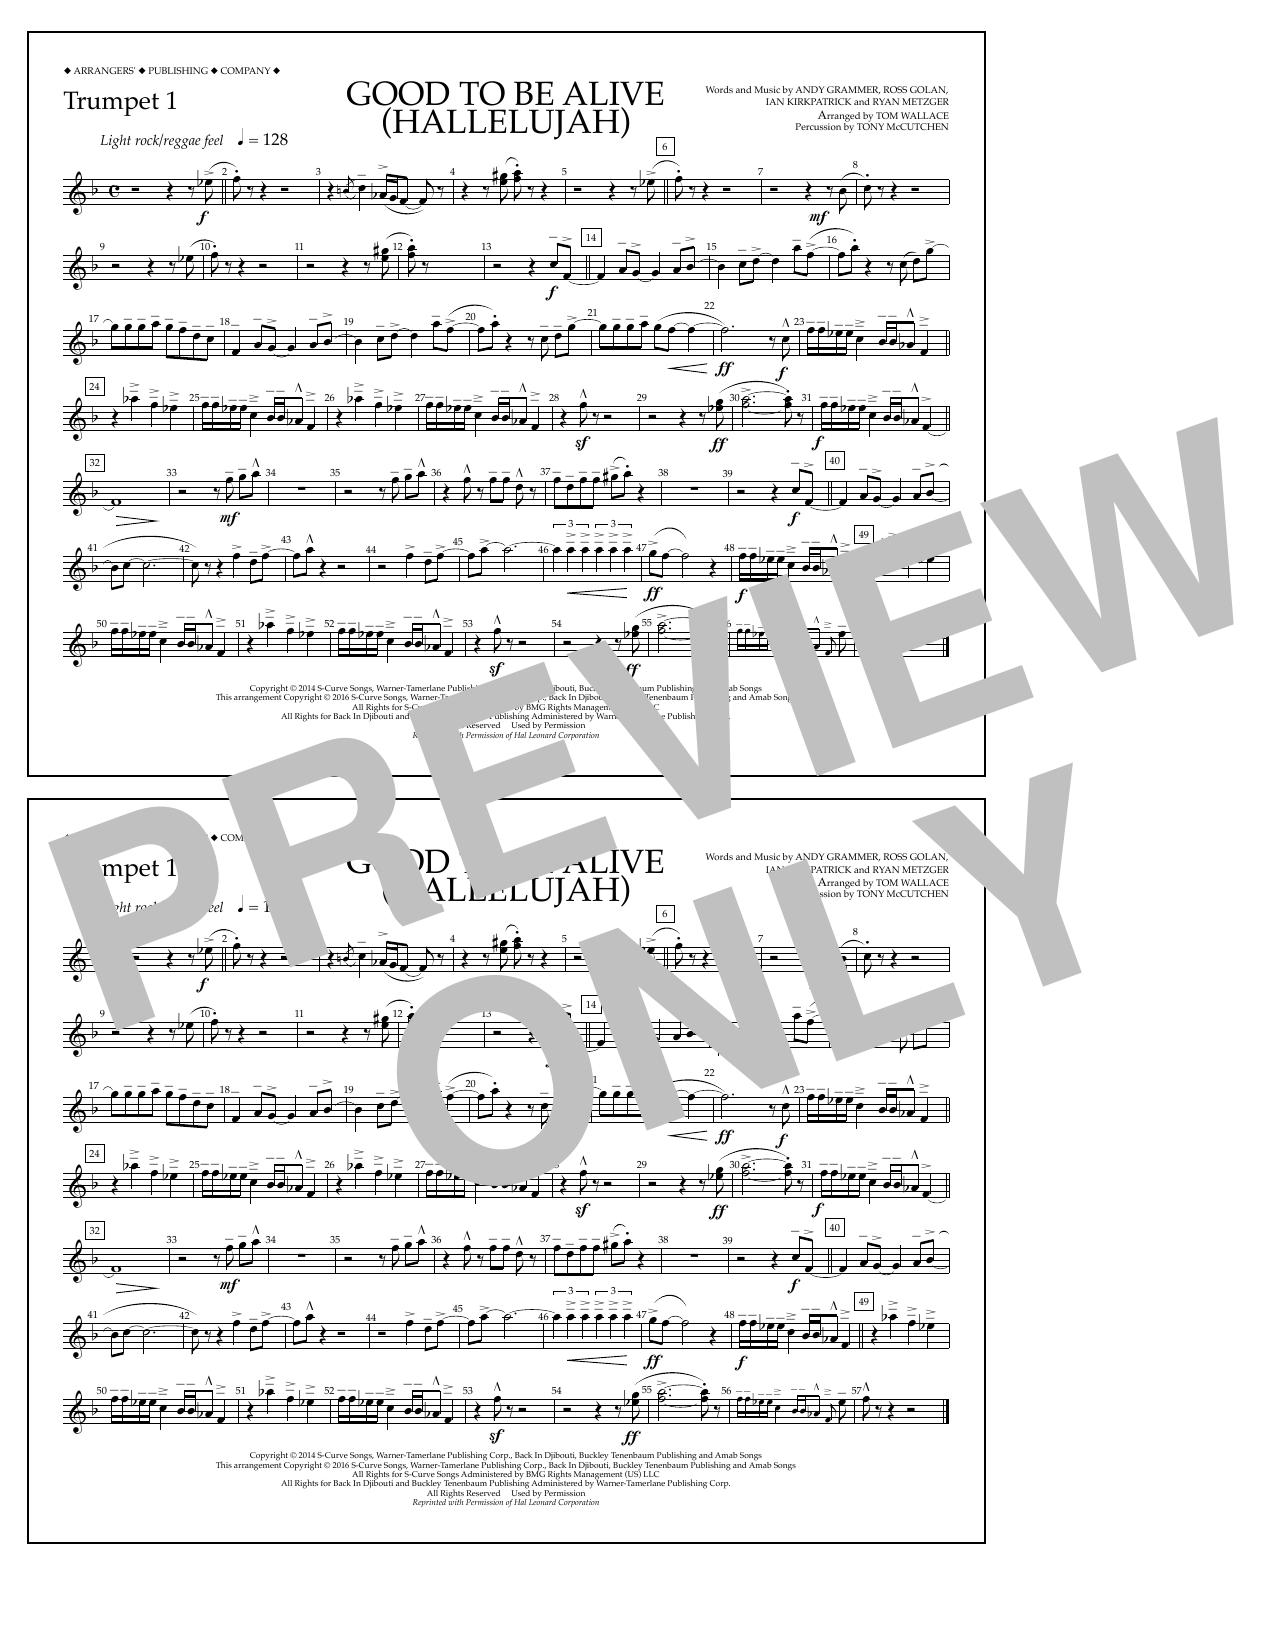 Andy Grammer - Good to Be Alive (Hallelujah) - Trumpet 1